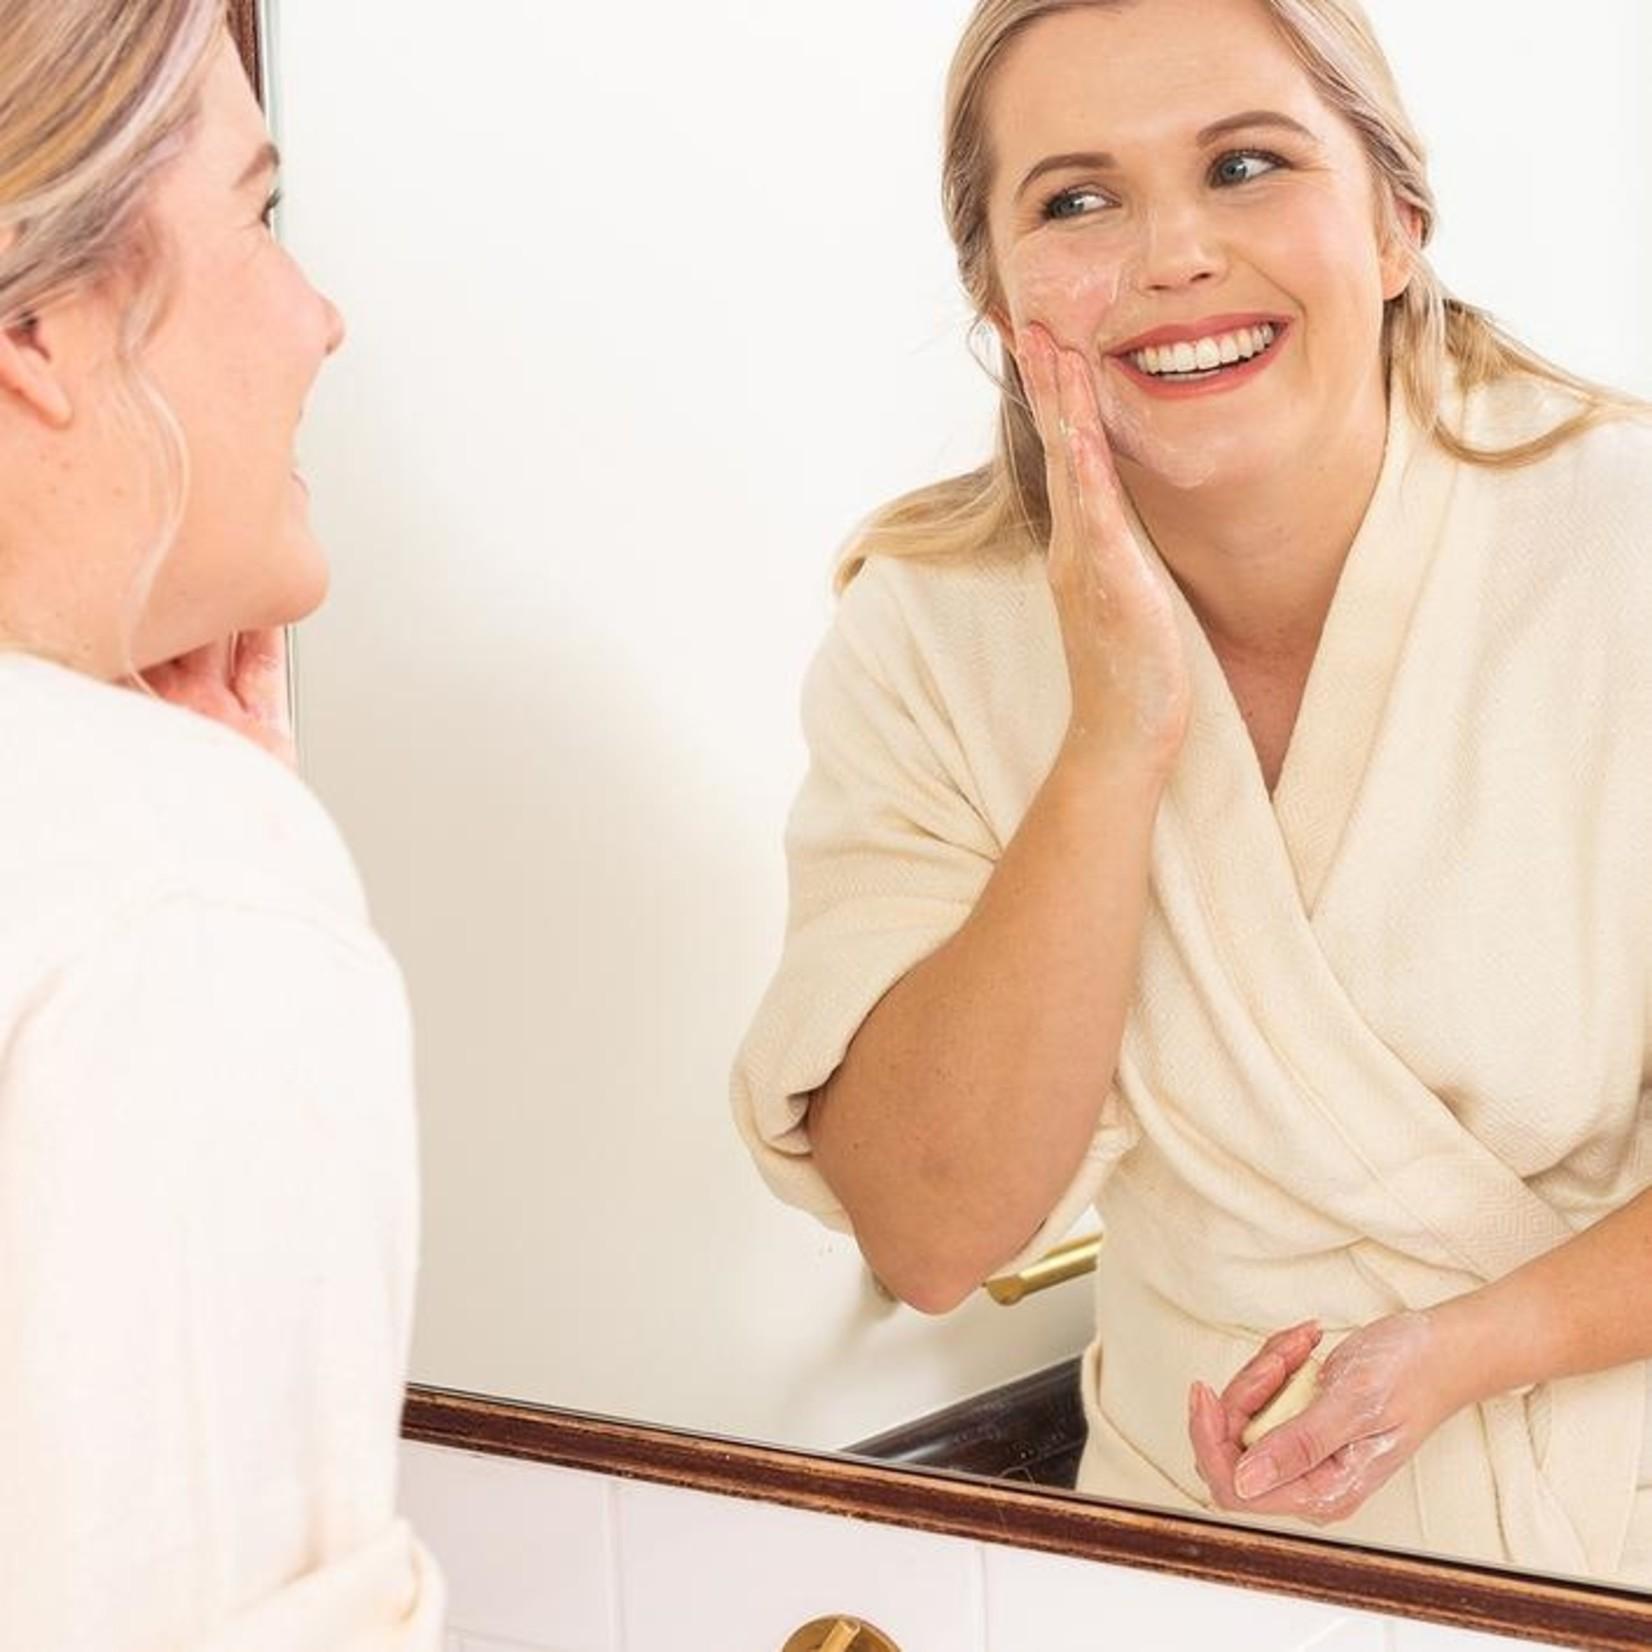 Ethique Ethique Face Cleanser & Makeup Remover Bar SuperStar!